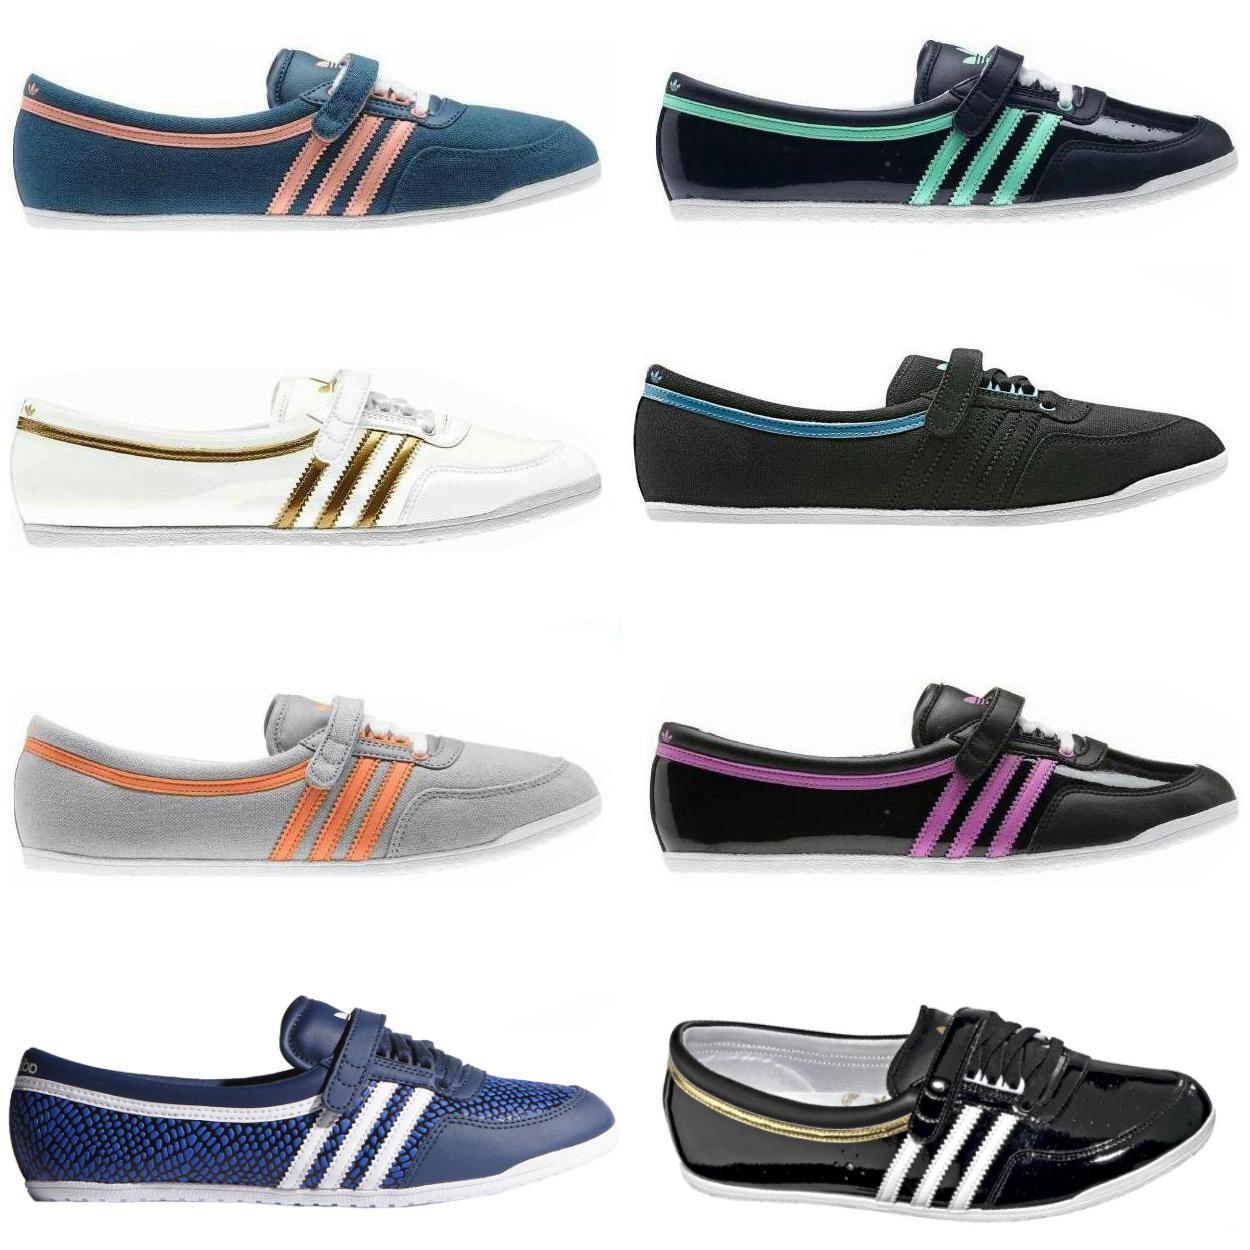 adidas originals concord round diverse farben schuhe slipper ballerina ebay. Black Bedroom Furniture Sets. Home Design Ideas